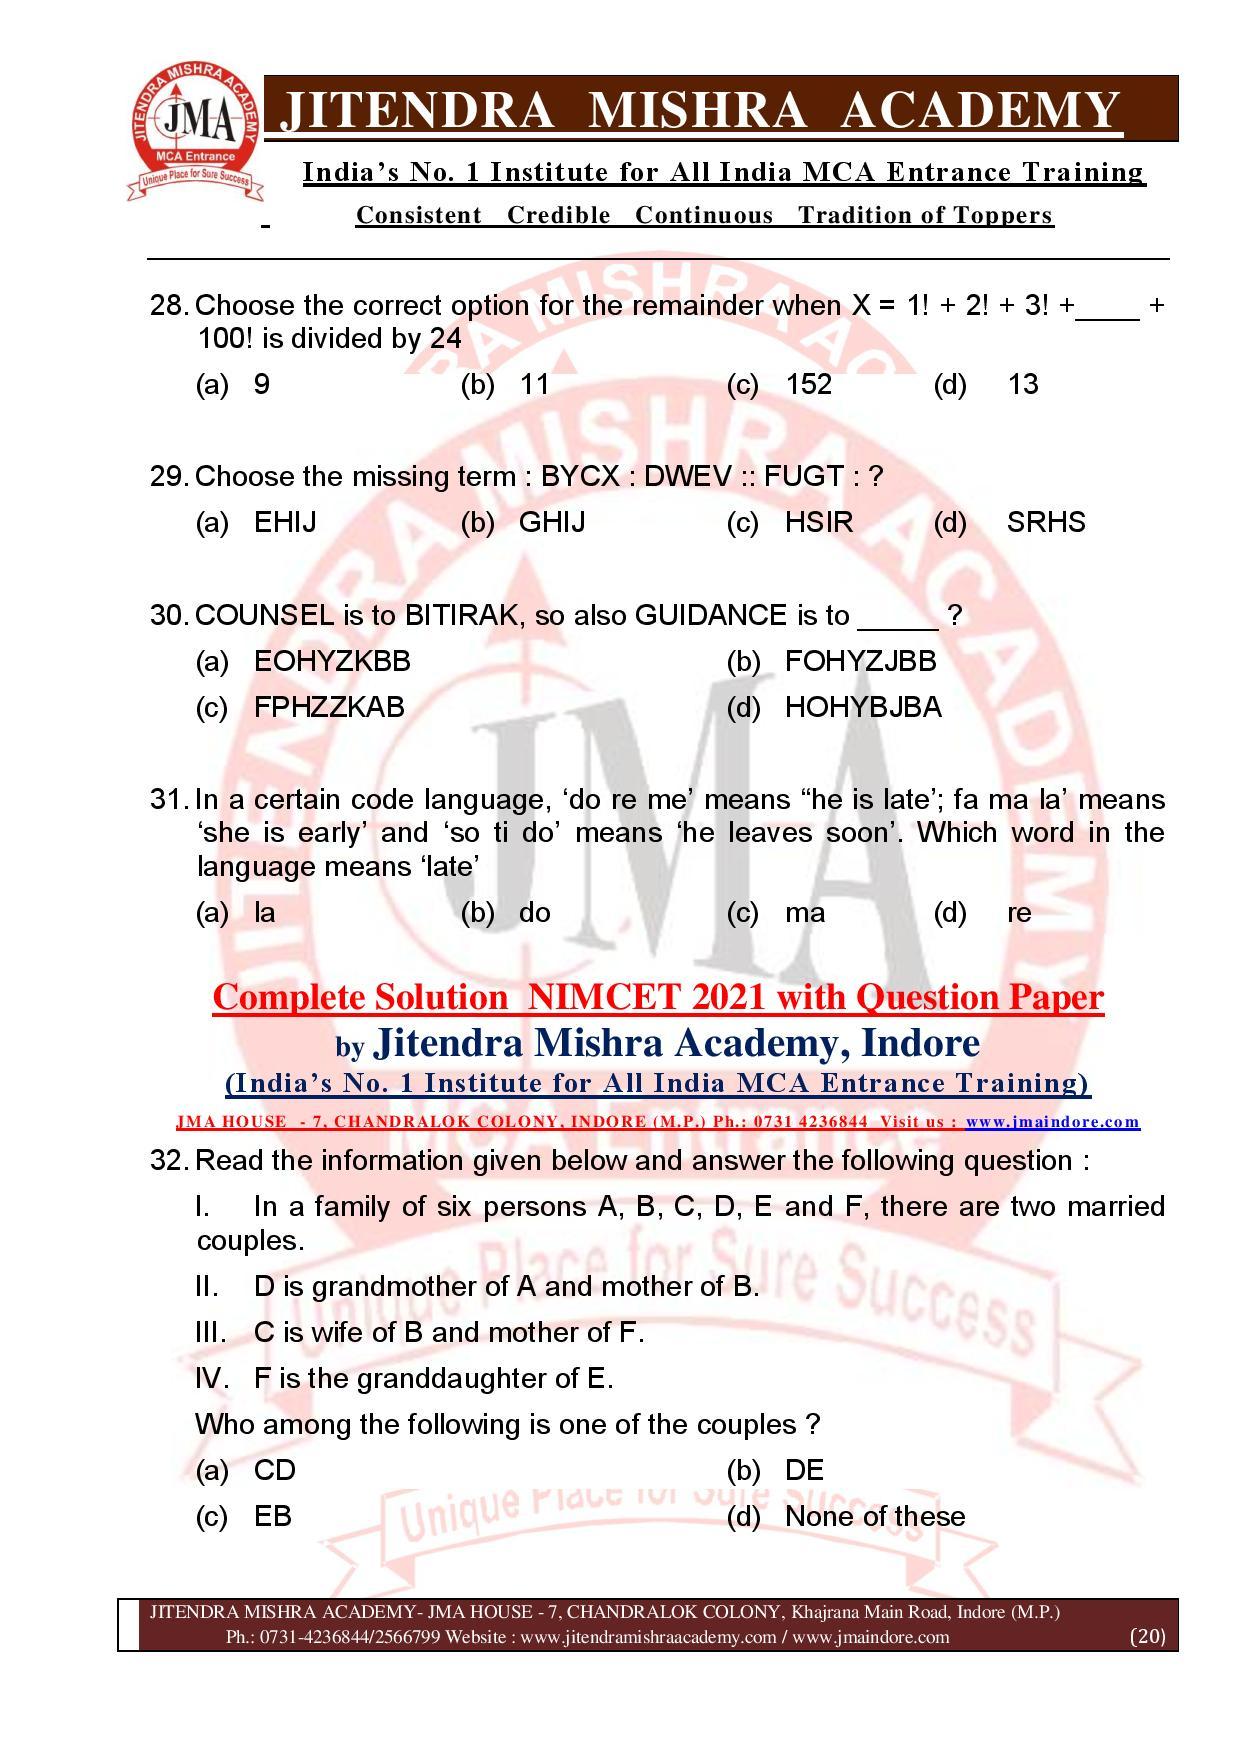 NIMCET 2021 QUESTION PAPER (F)-page-020